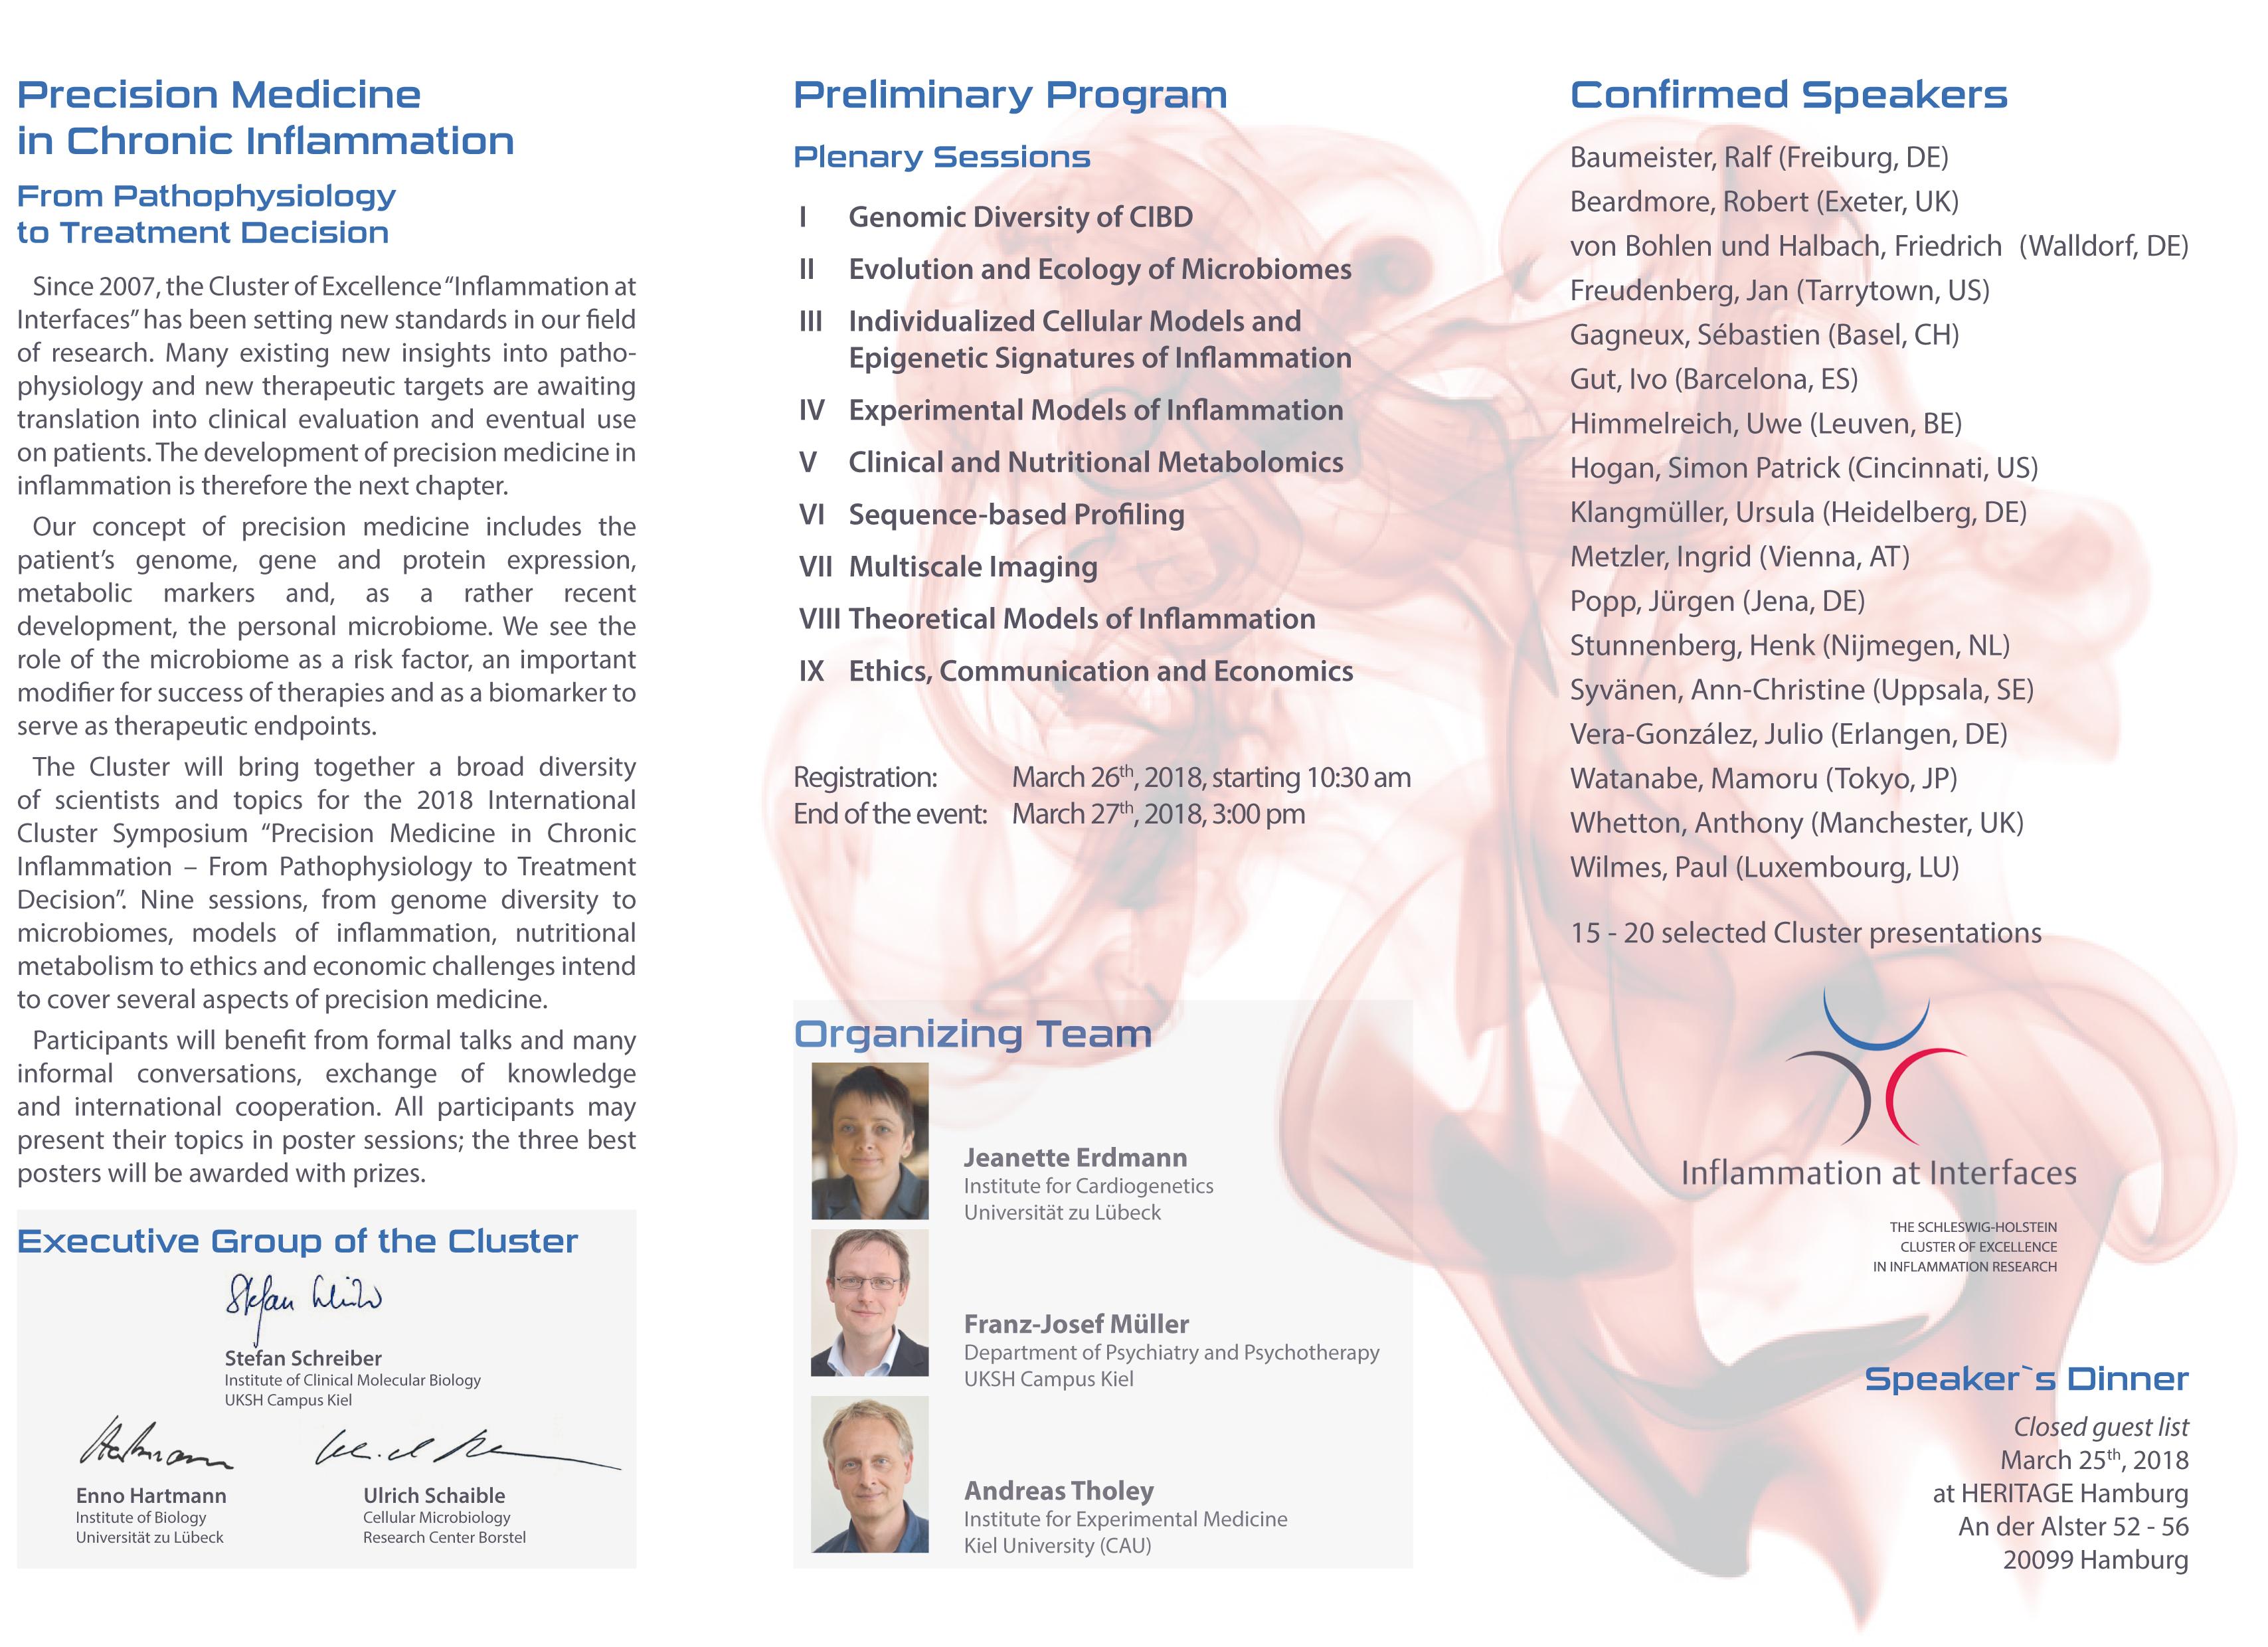 International Cluster Symposium